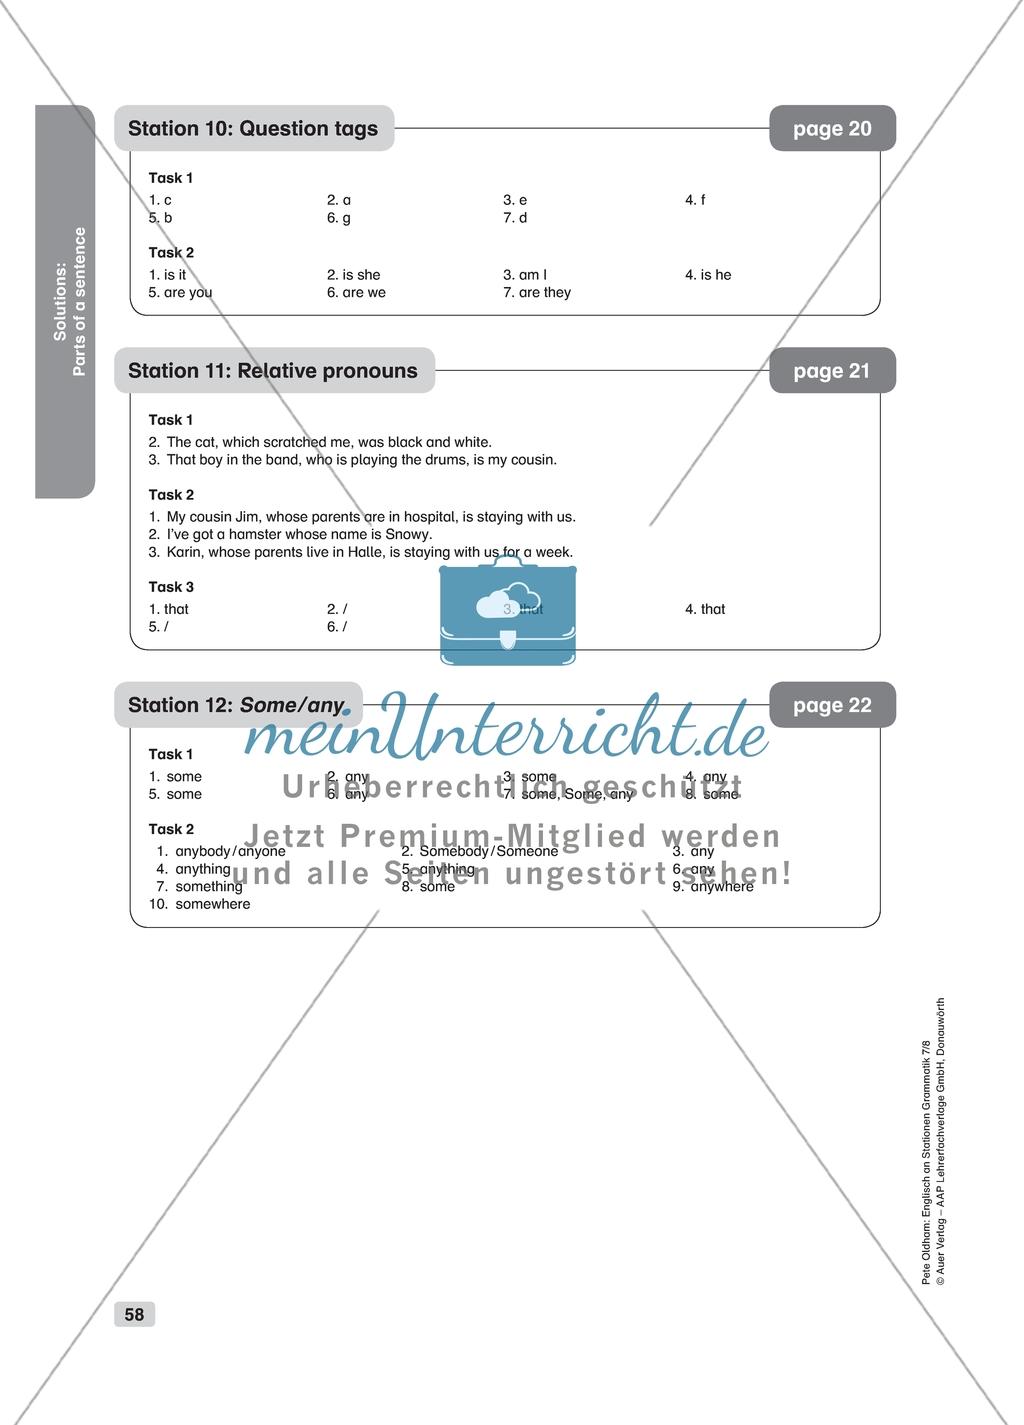 Grammar Relative Pronouns Worksheet And Solution